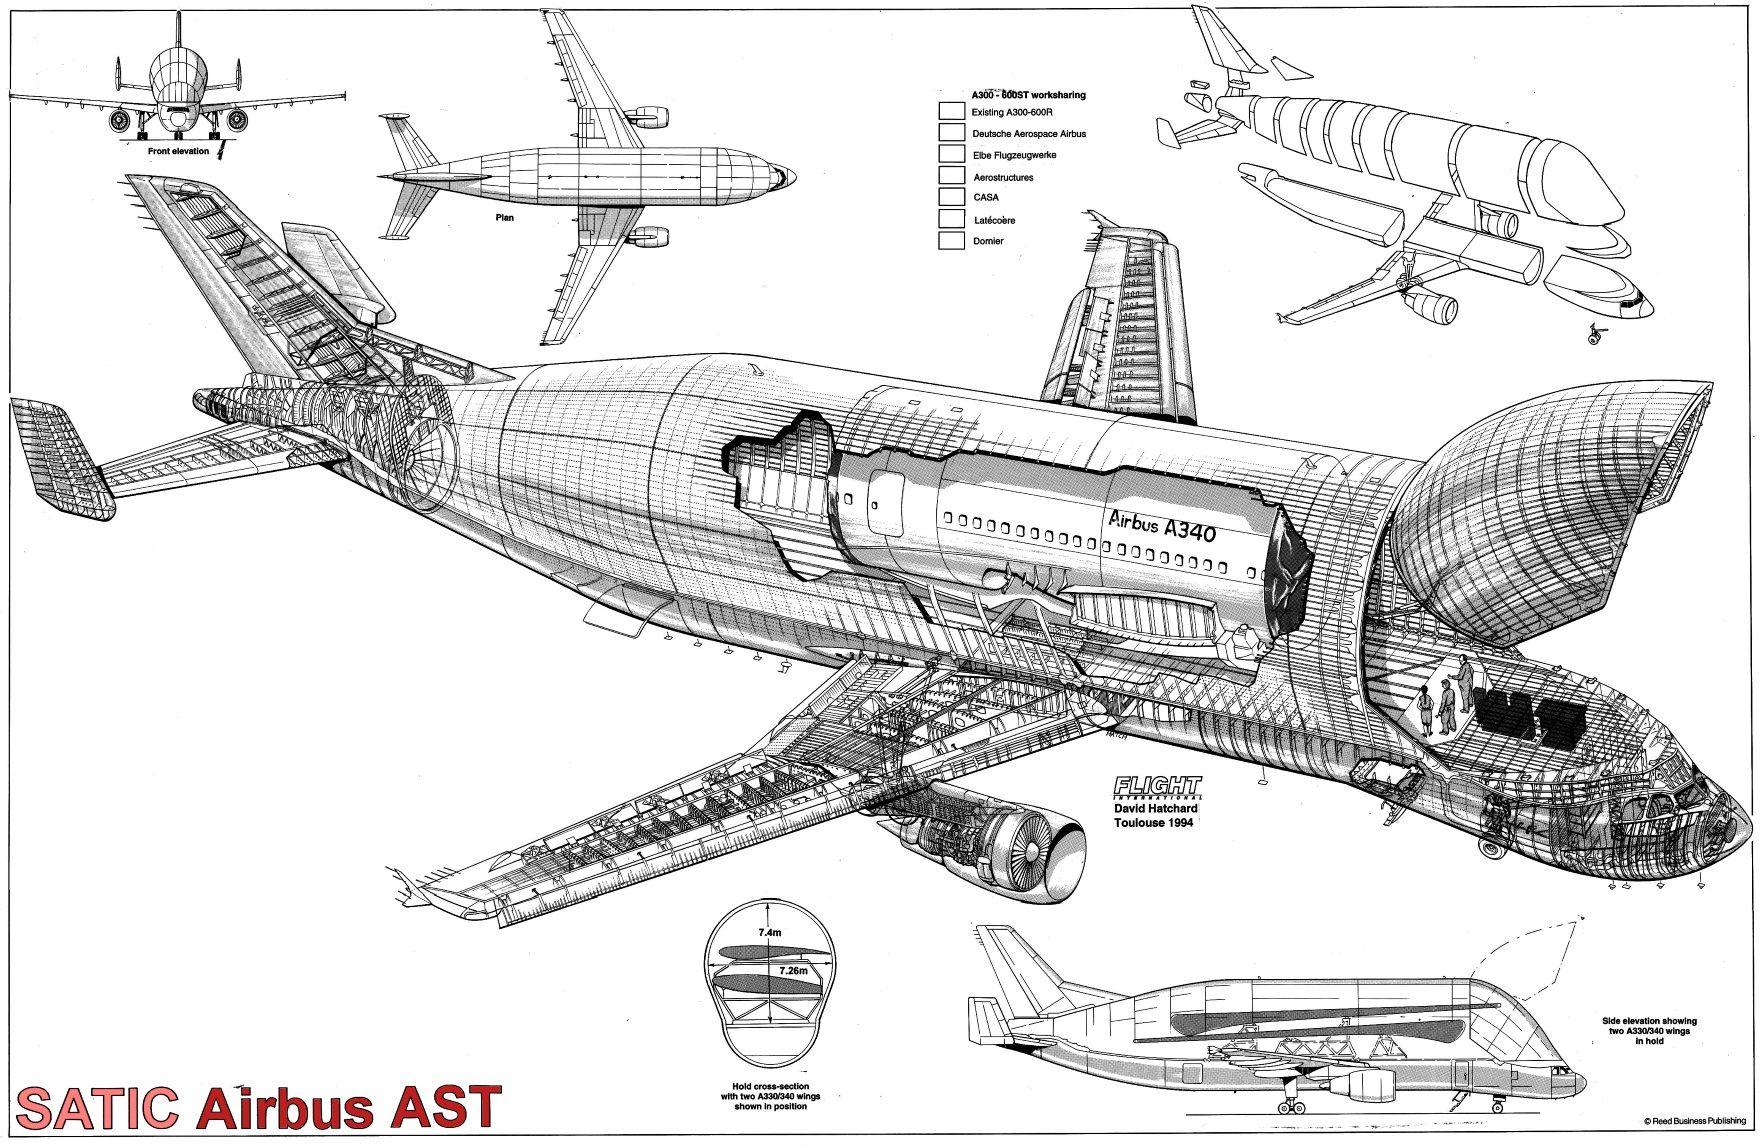 British Airways Plane Seating